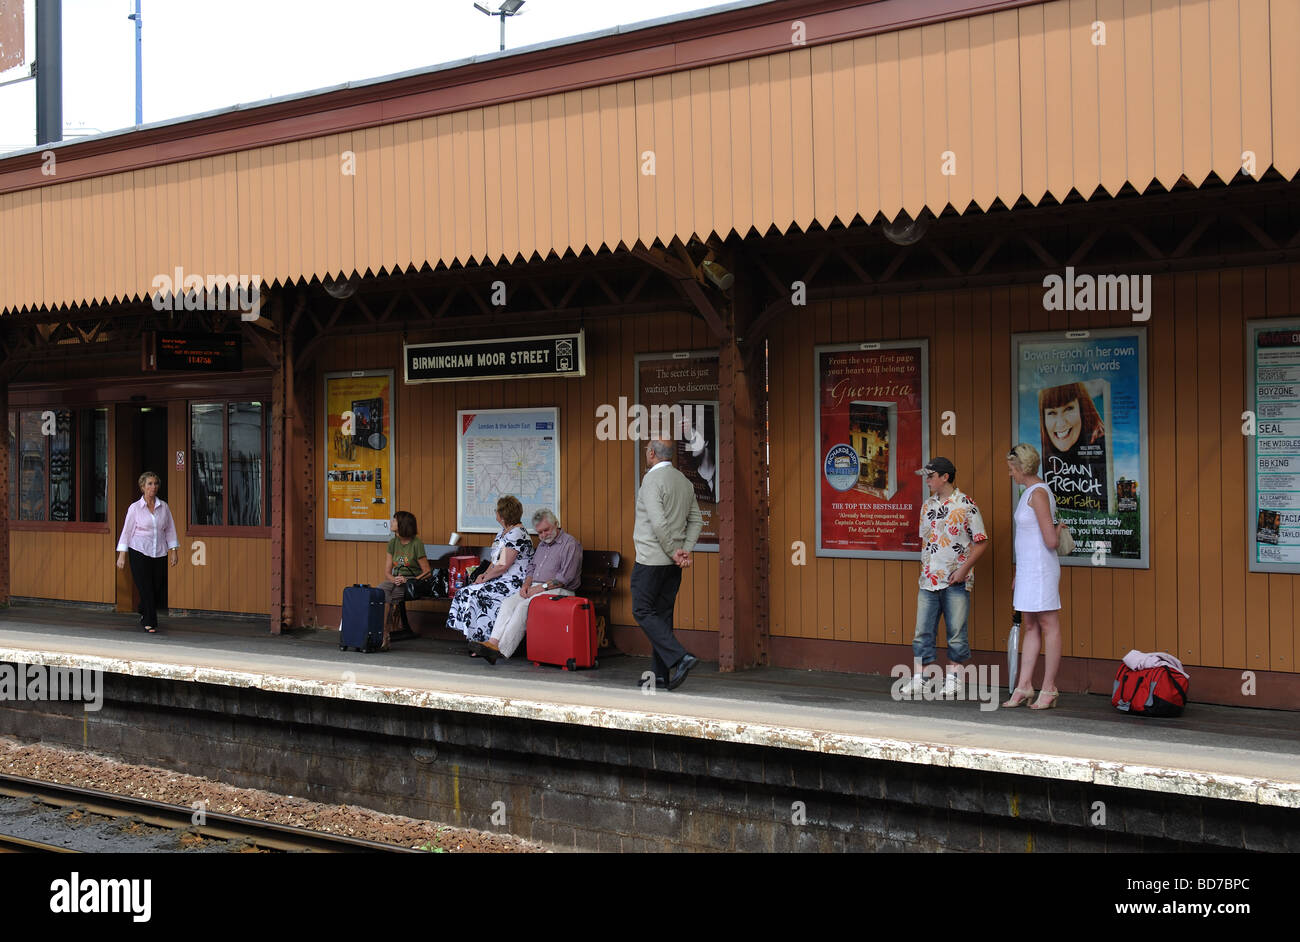 Moor Street railway station, Birmingham, England, UK Stock Photo